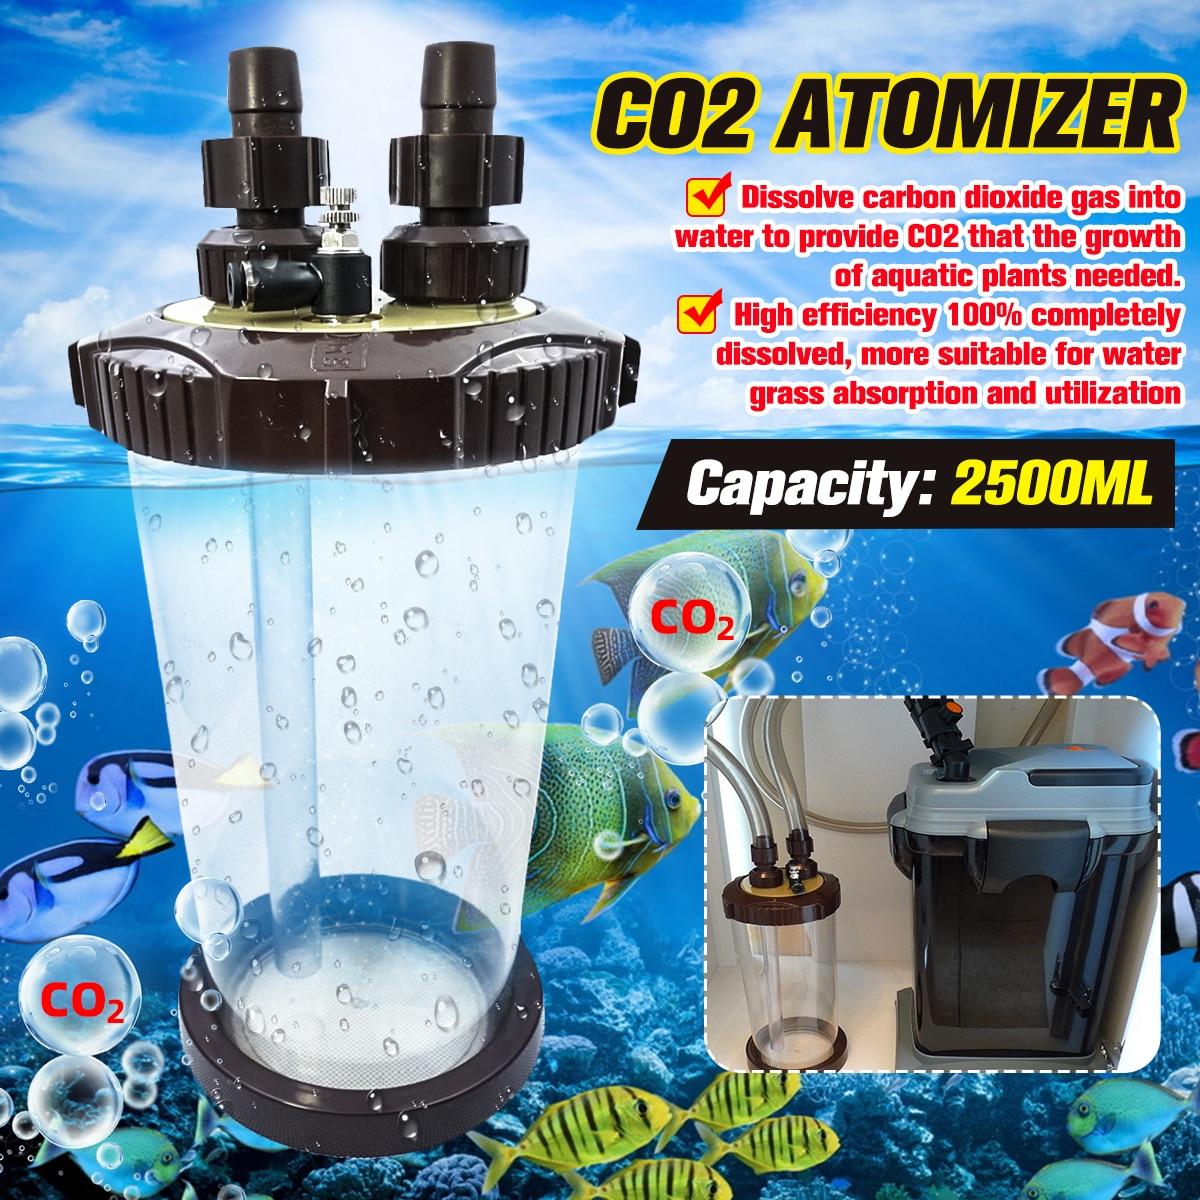 Clear CO2 Atomizer External Turbo Super Diffuser Atomizer Fish Tank Aquarium WaterPlant Fish Tank Landscape Aquatic 2500ML